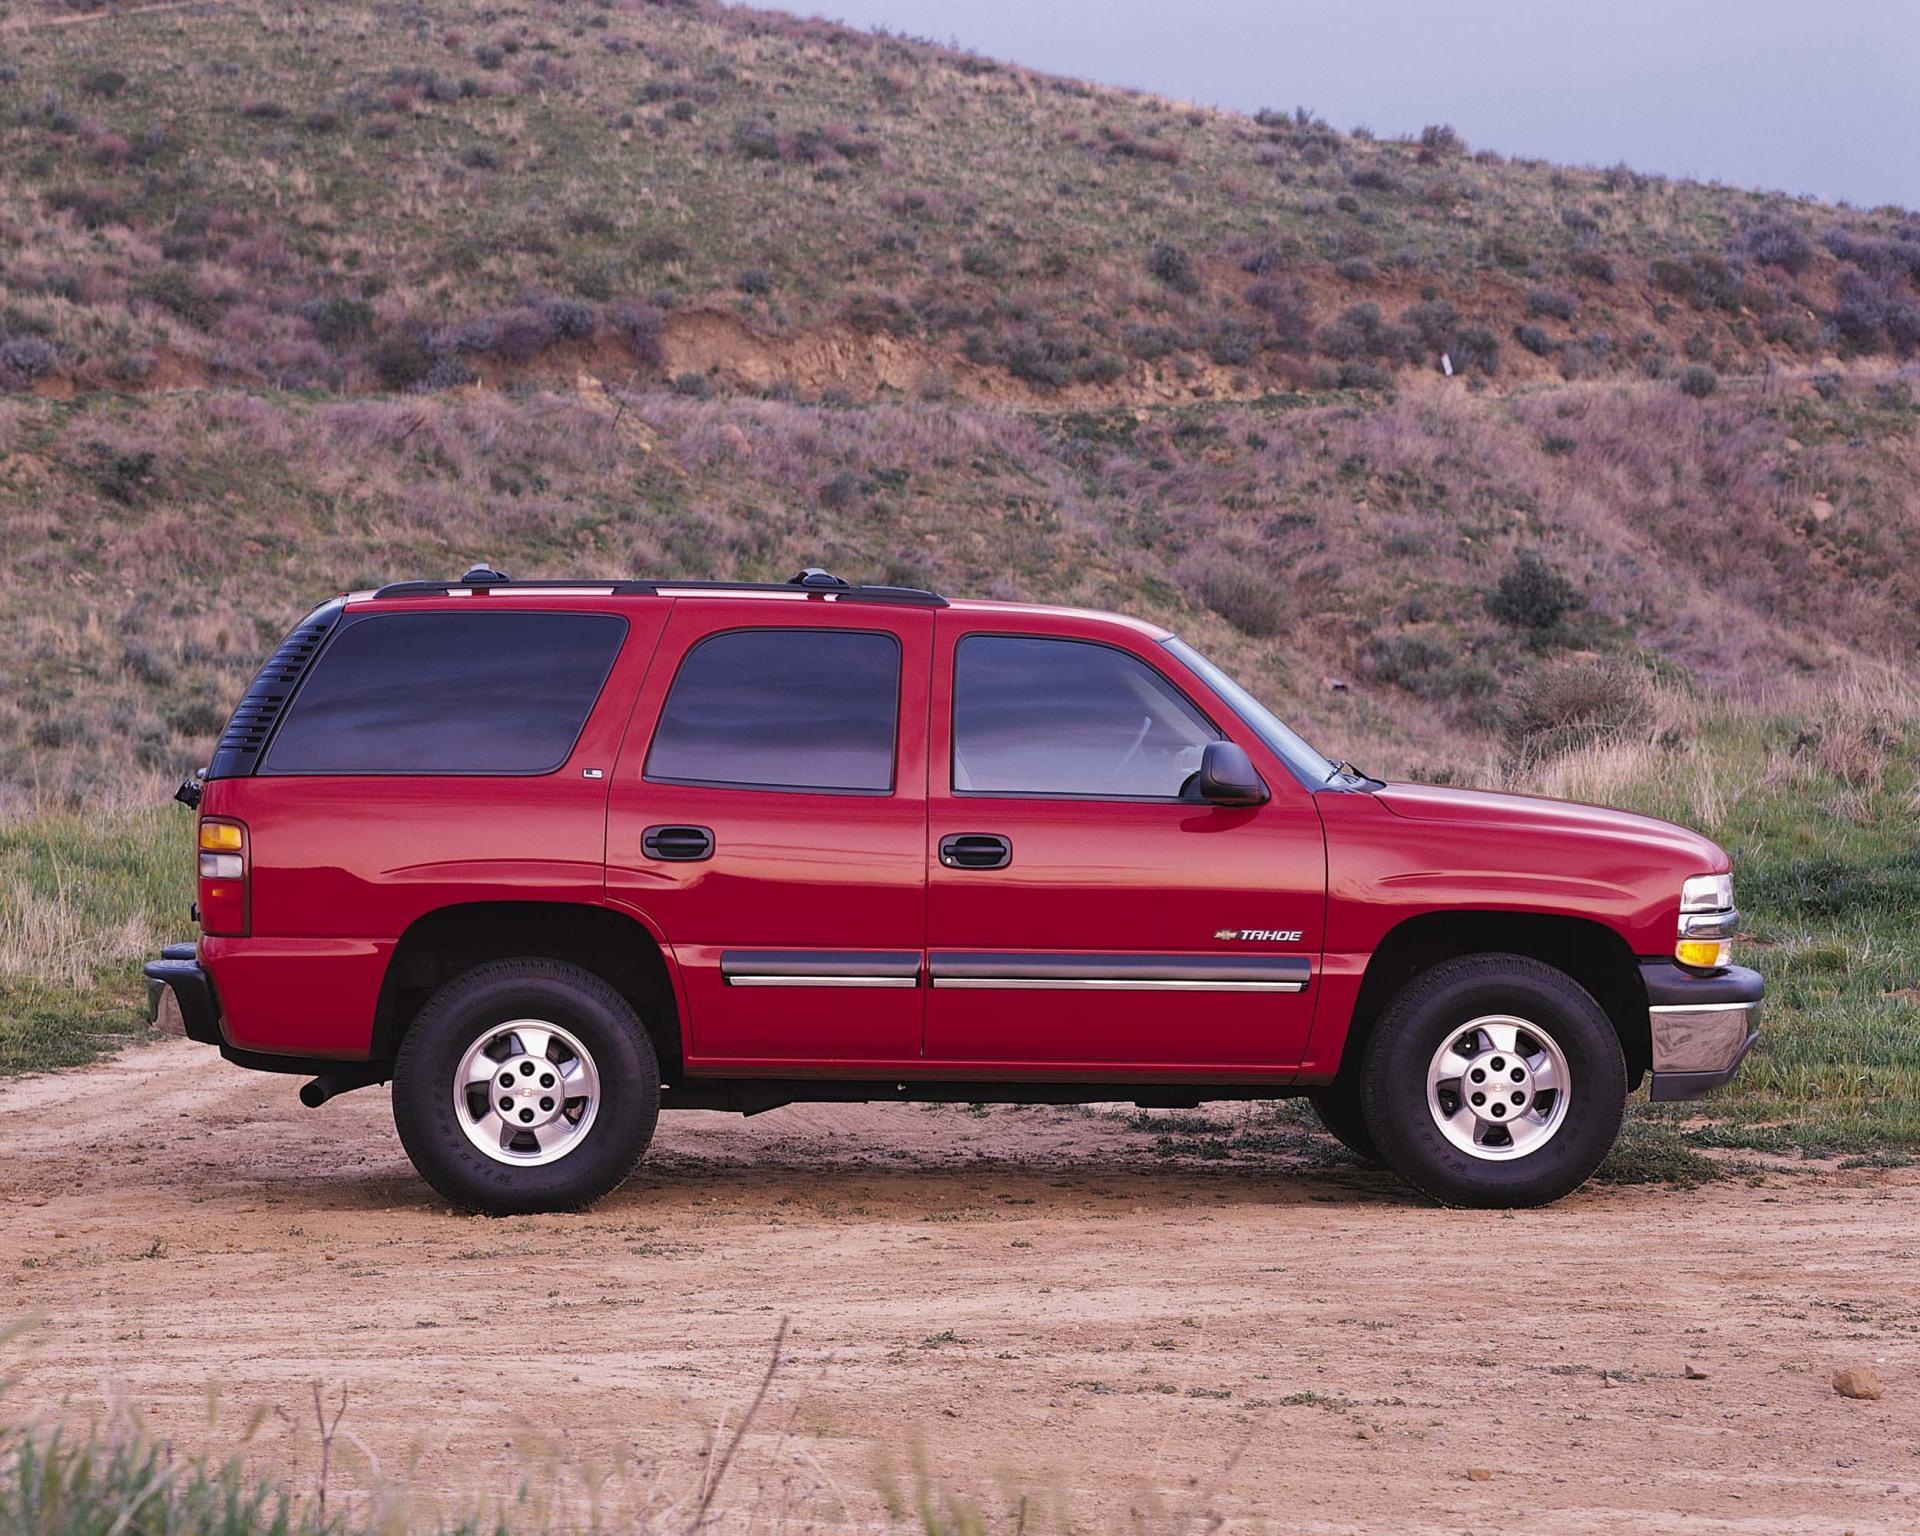 2001 Chevrolet Tahoe | conceptcarz.com